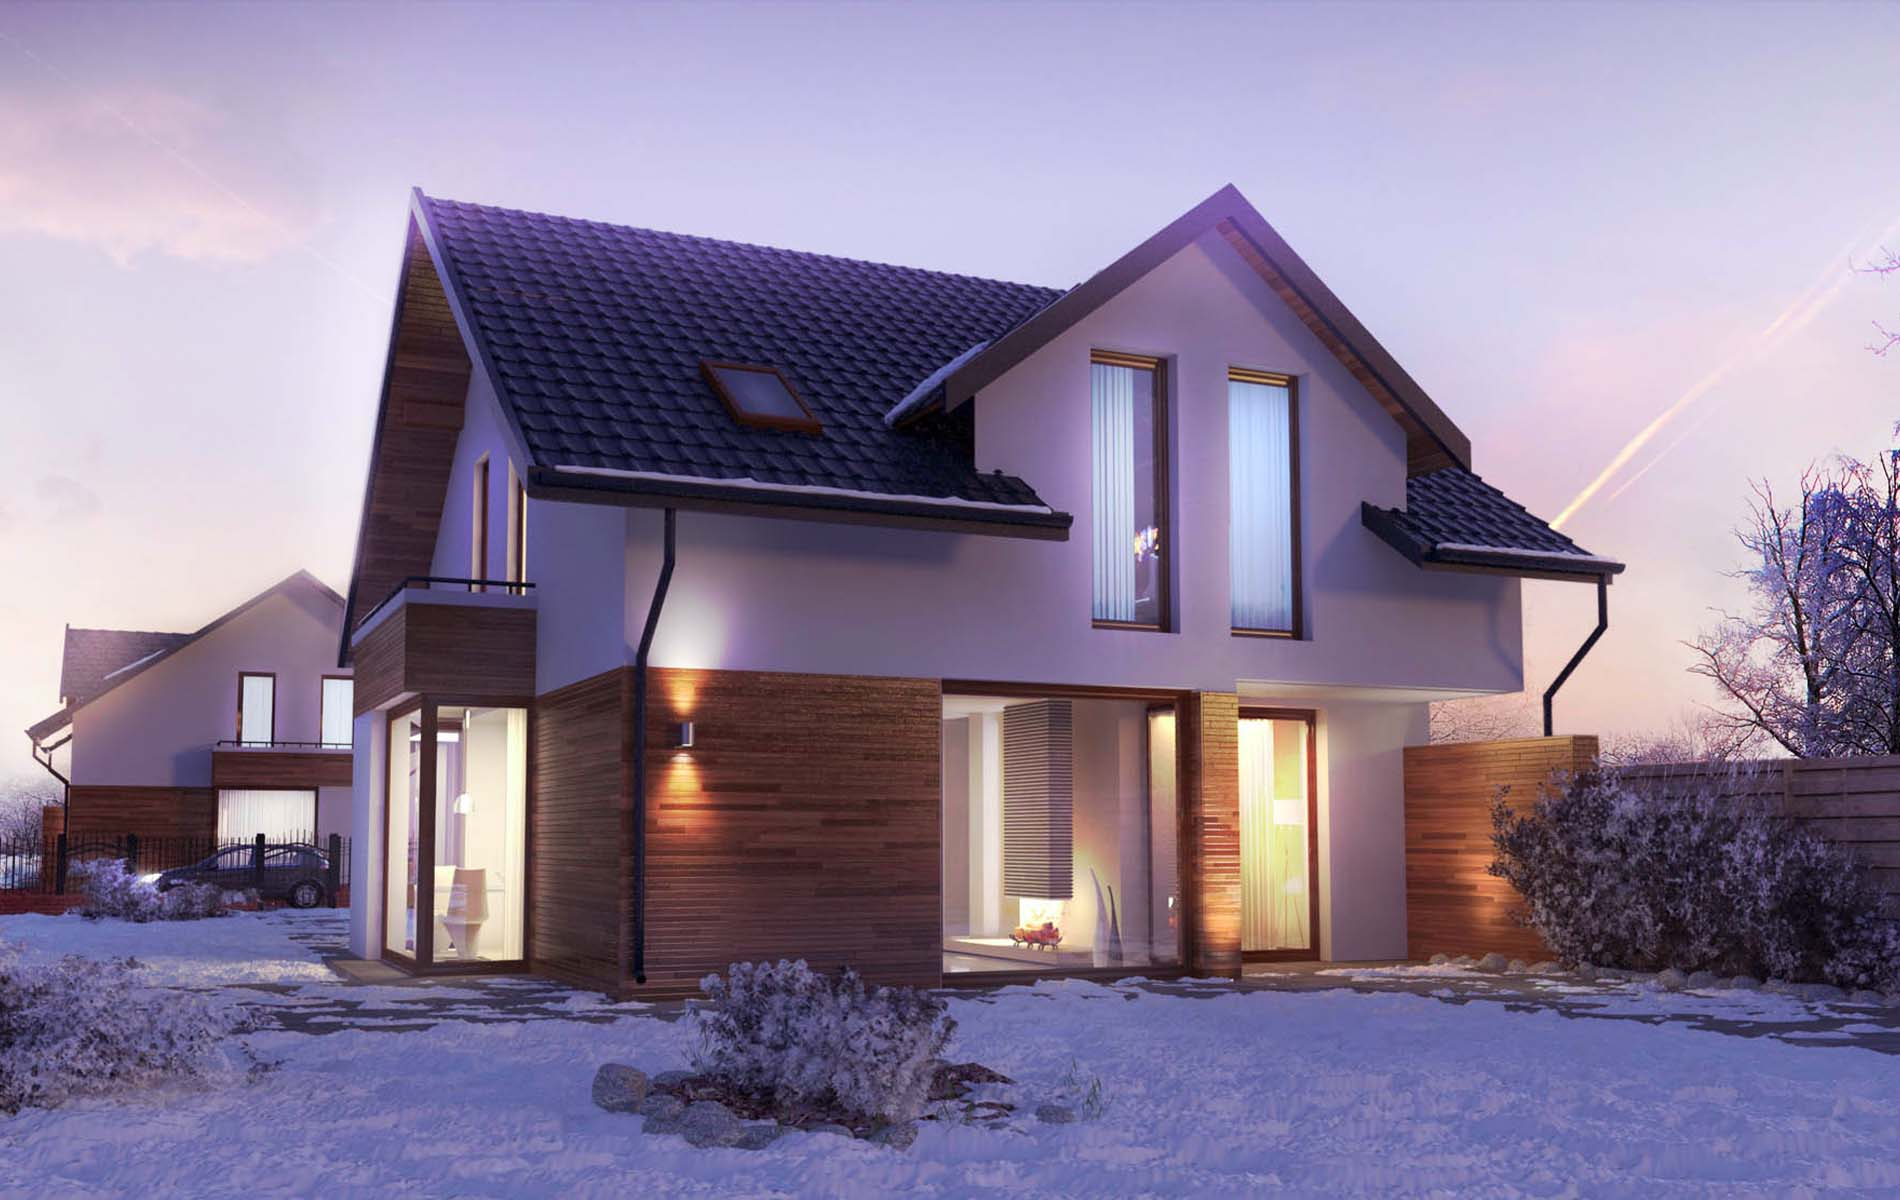 Pfneiszl bau gmbh holzbau massivbau einfamilienhaus for Planung einfamilienhaus